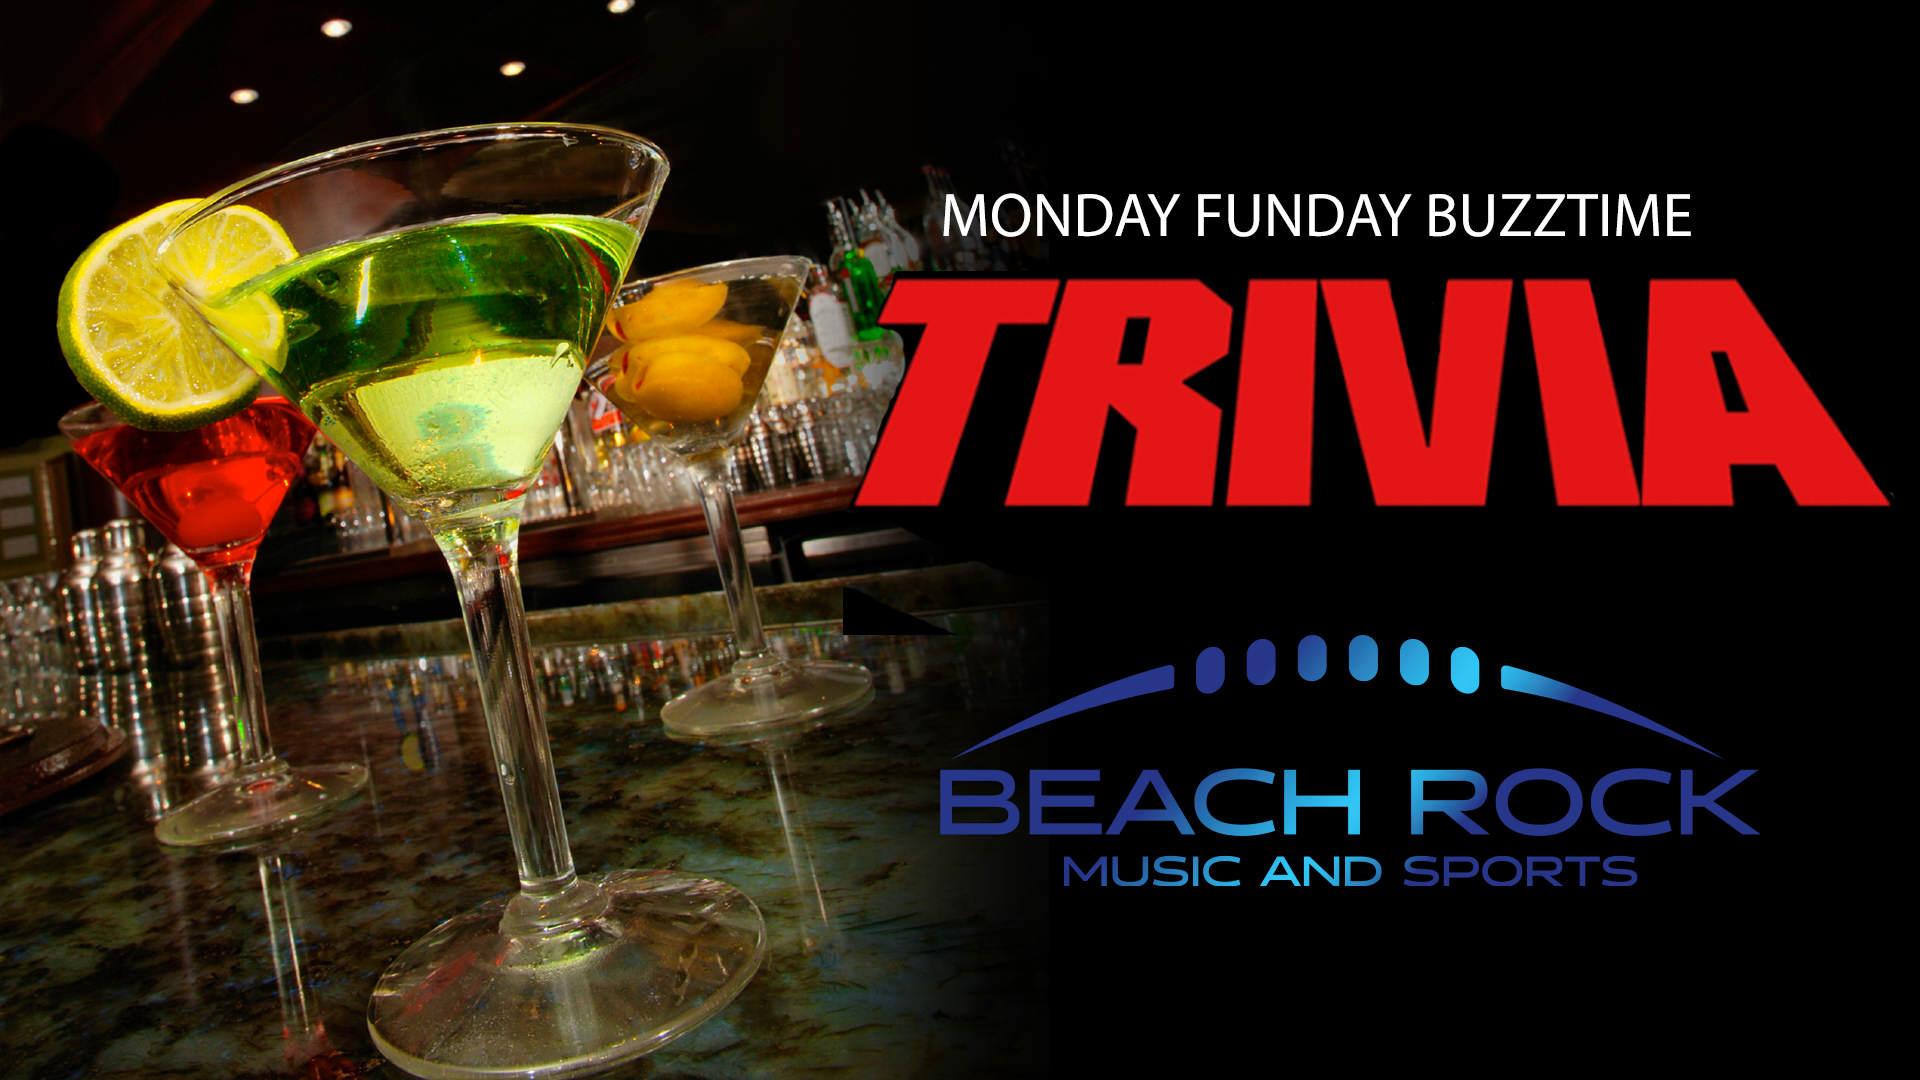 Monday Funday Buzztime Trivia